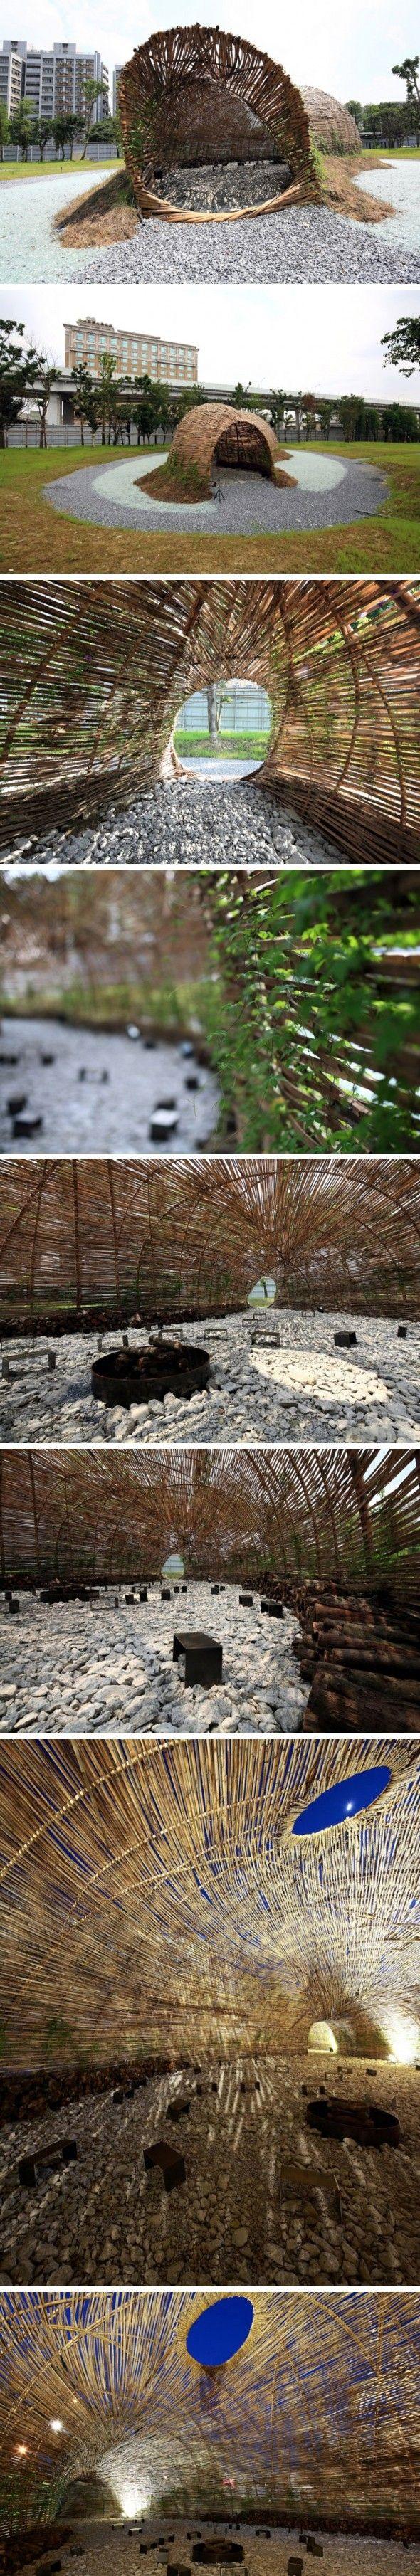 Cicada: Structure en bambou à Taipei, Taiwan, Marco Casagrande                                                                                                                                                                                 Plus